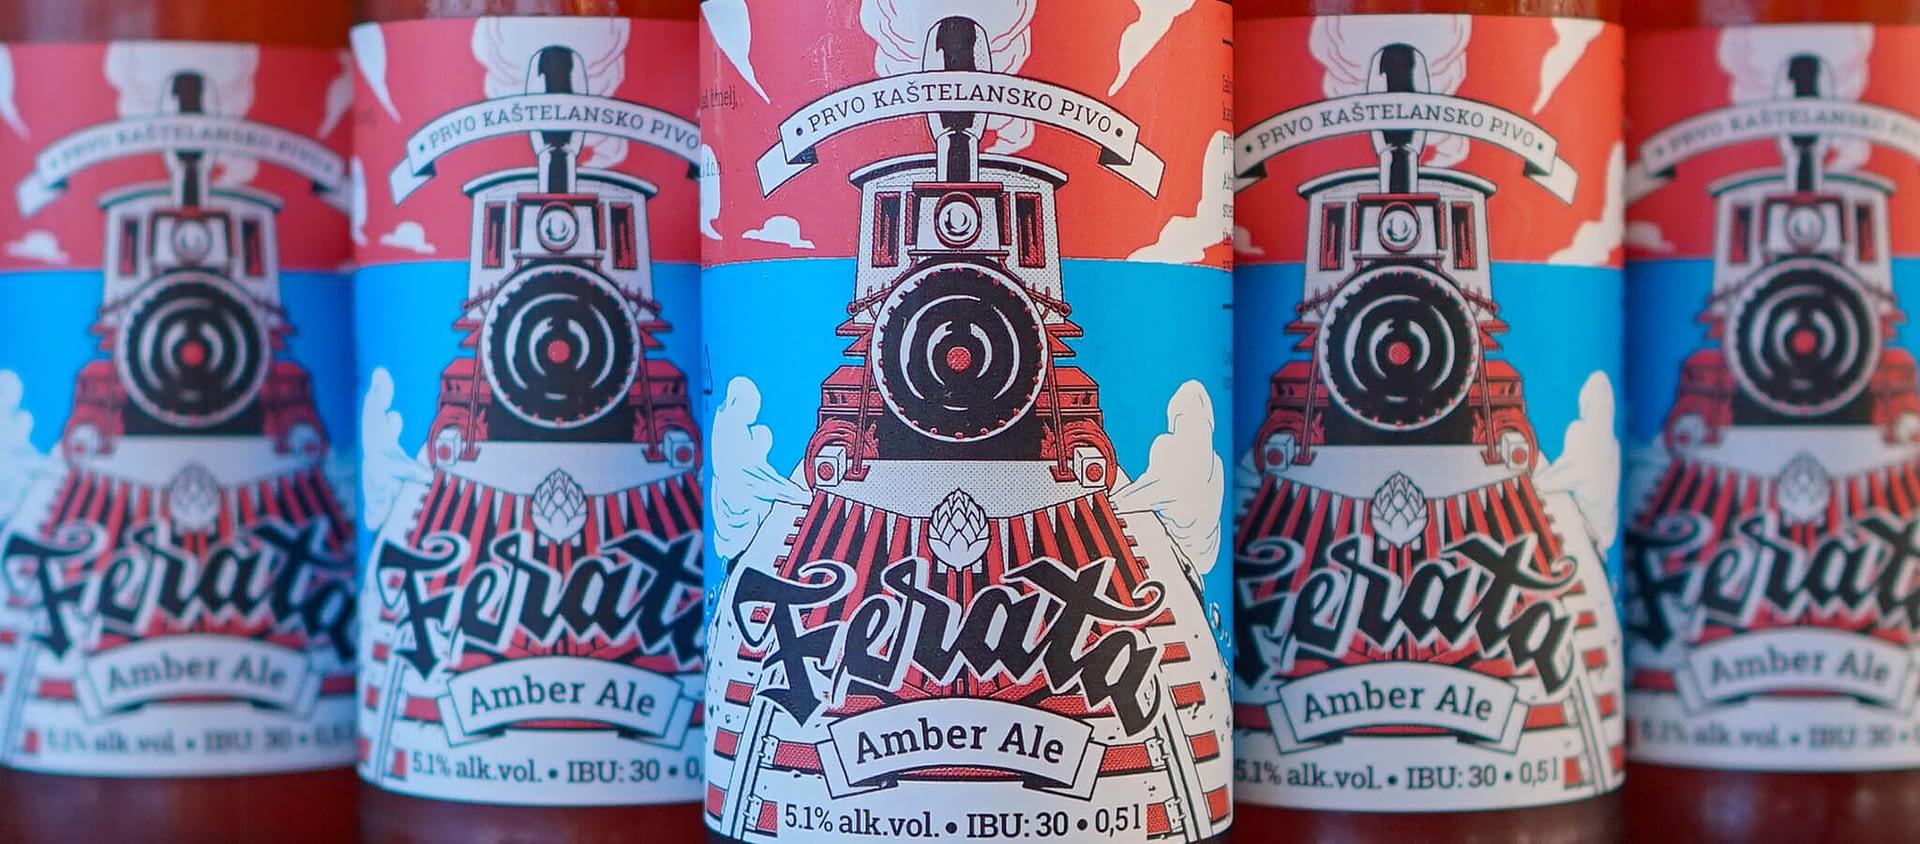 Kaštelanska craft pivovara s dušom